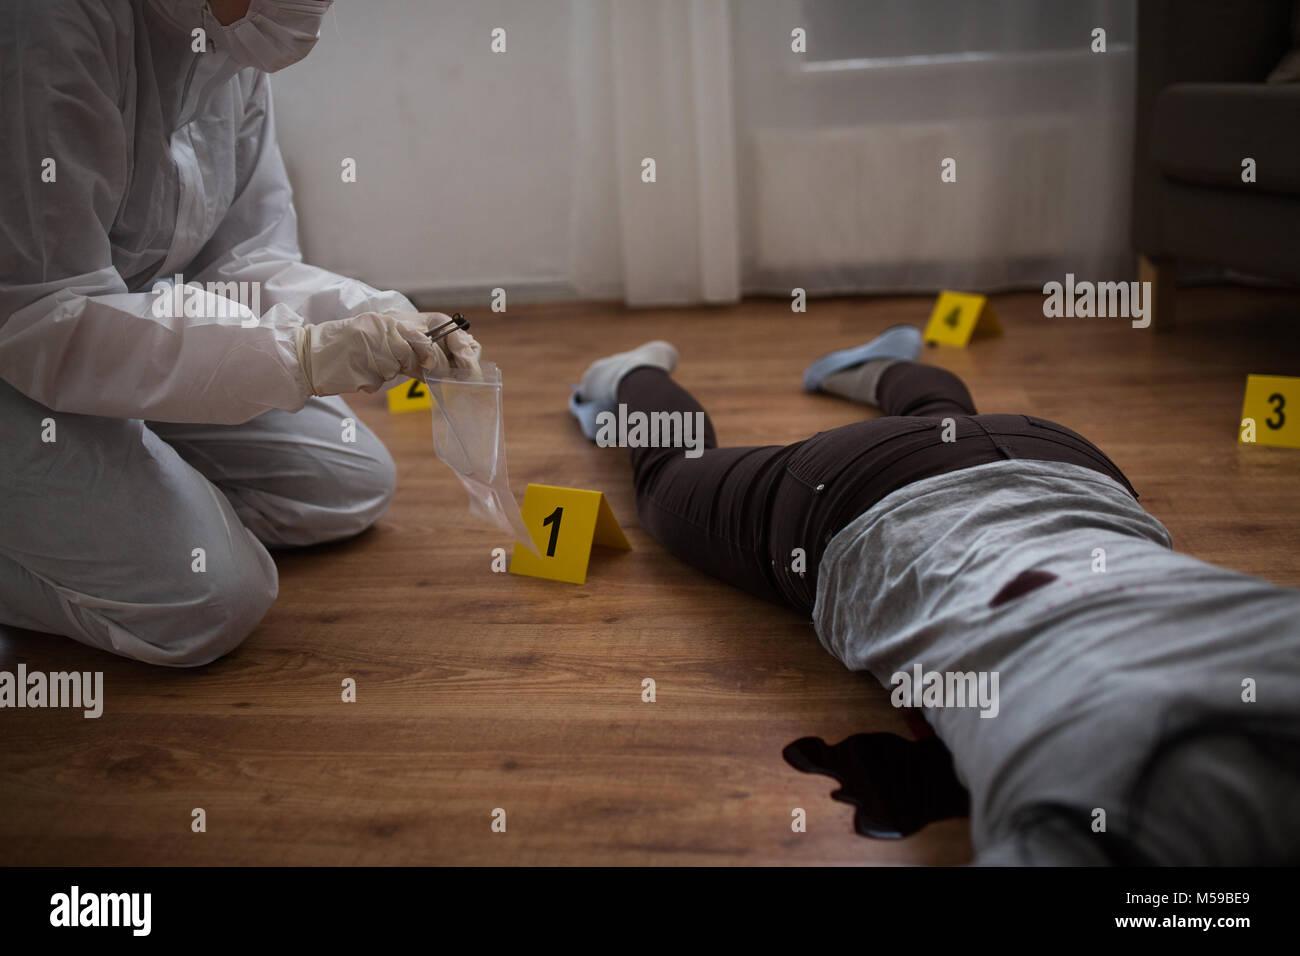 criminalist collecting crime scene evidence - Stock Image